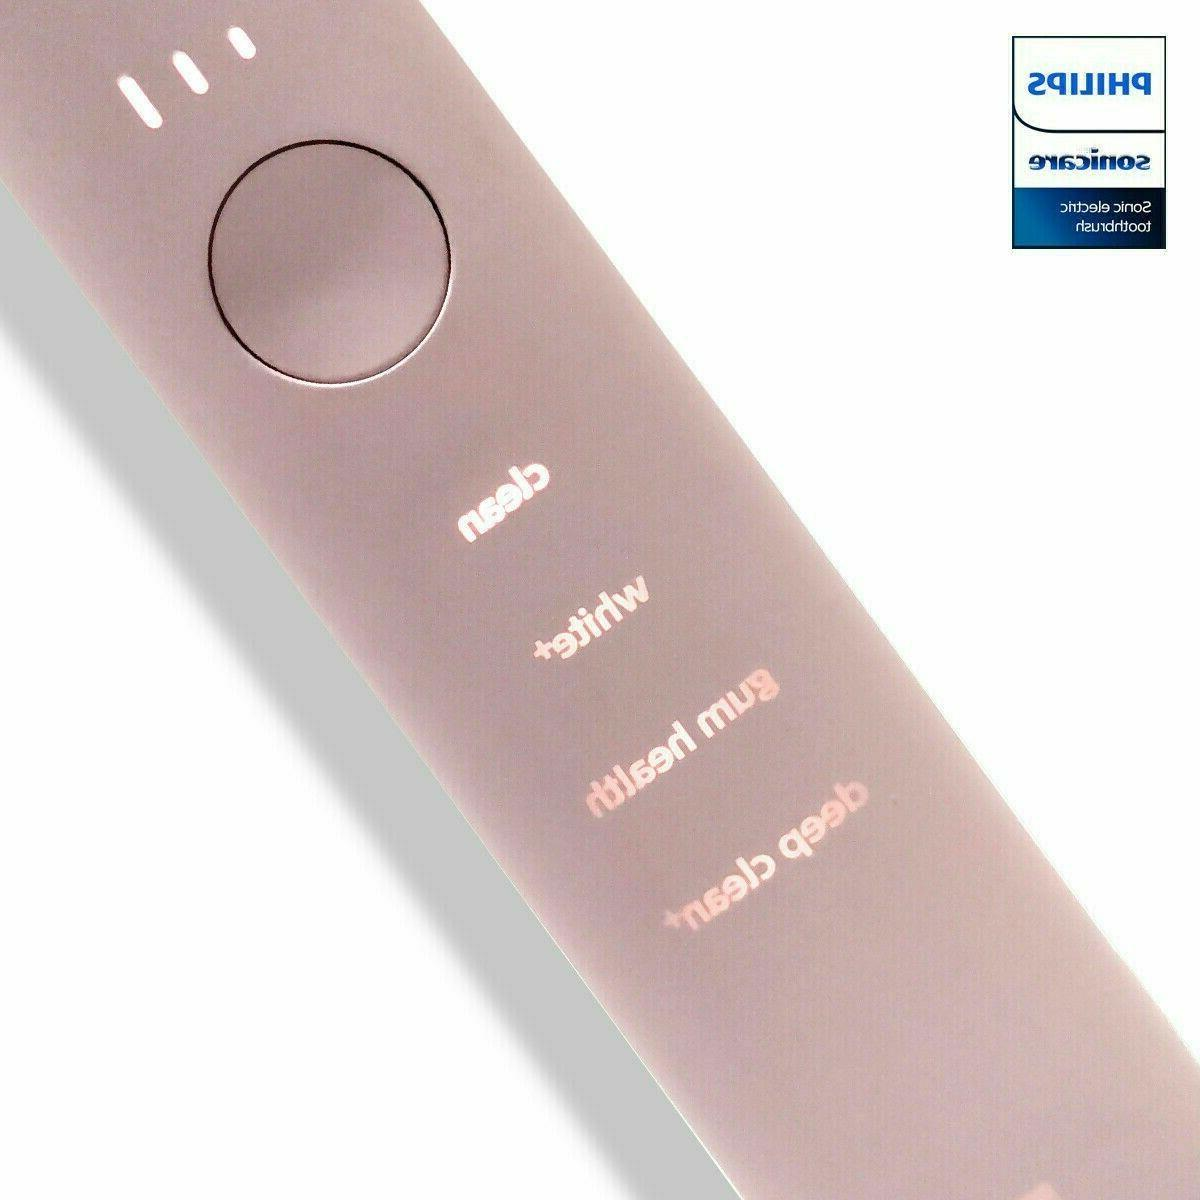 Philips Smart HX992P Handle Pink